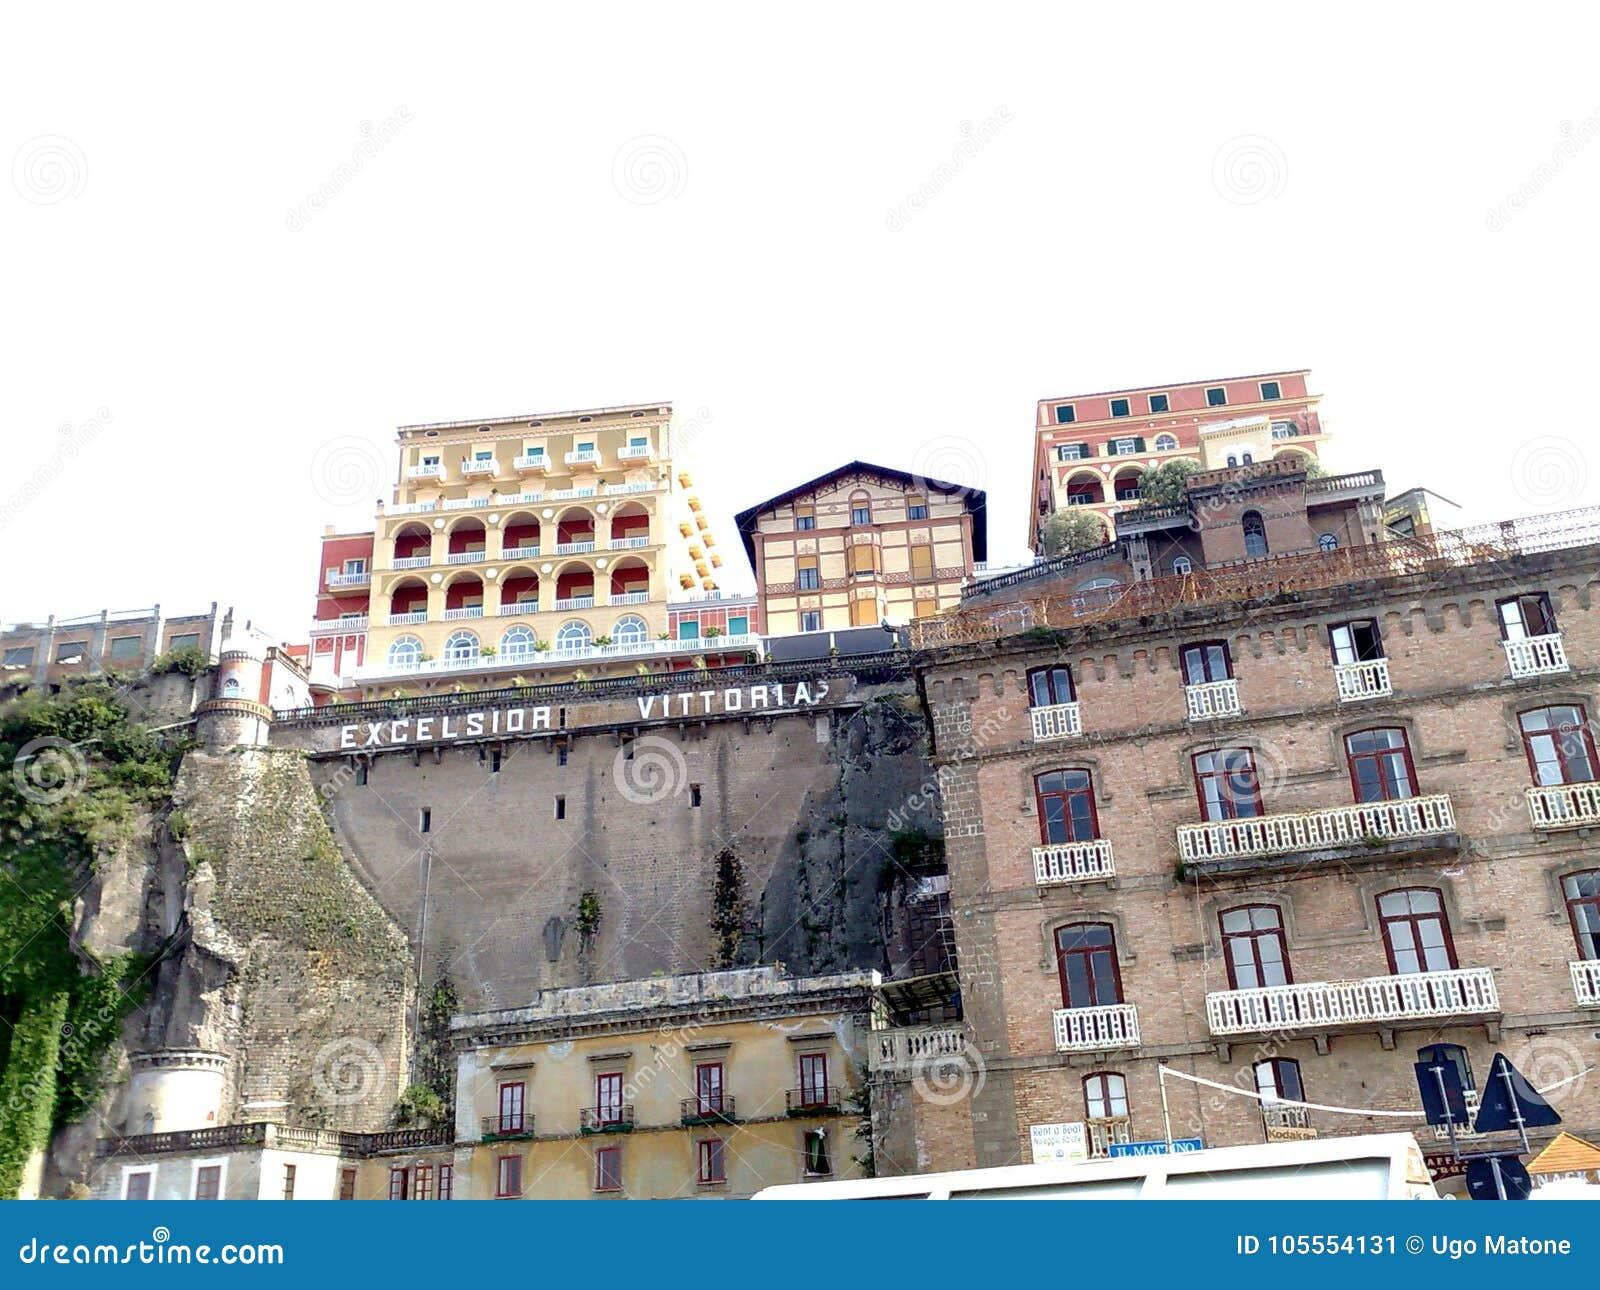 Hotell excelsior Vittoria Sorrento från porten